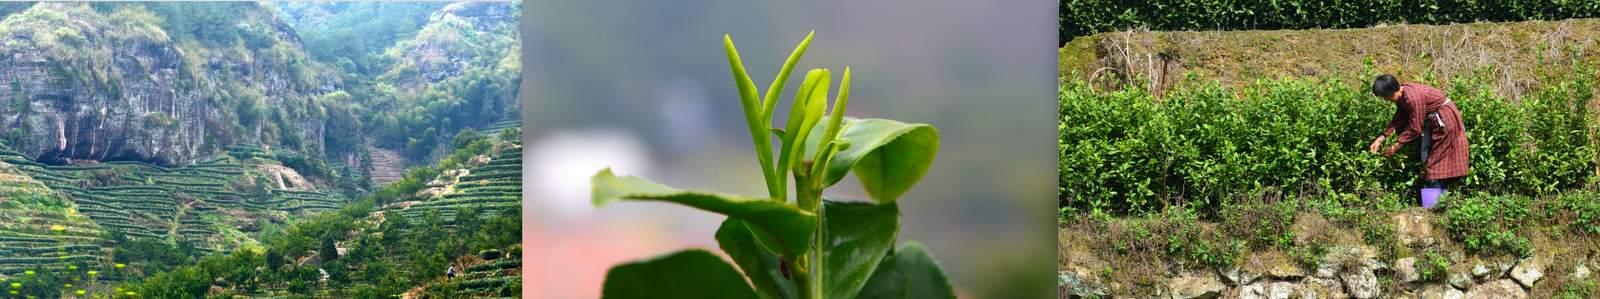 Green Tea Fresh 2015 First Flush Ming Qian China rarest specialities